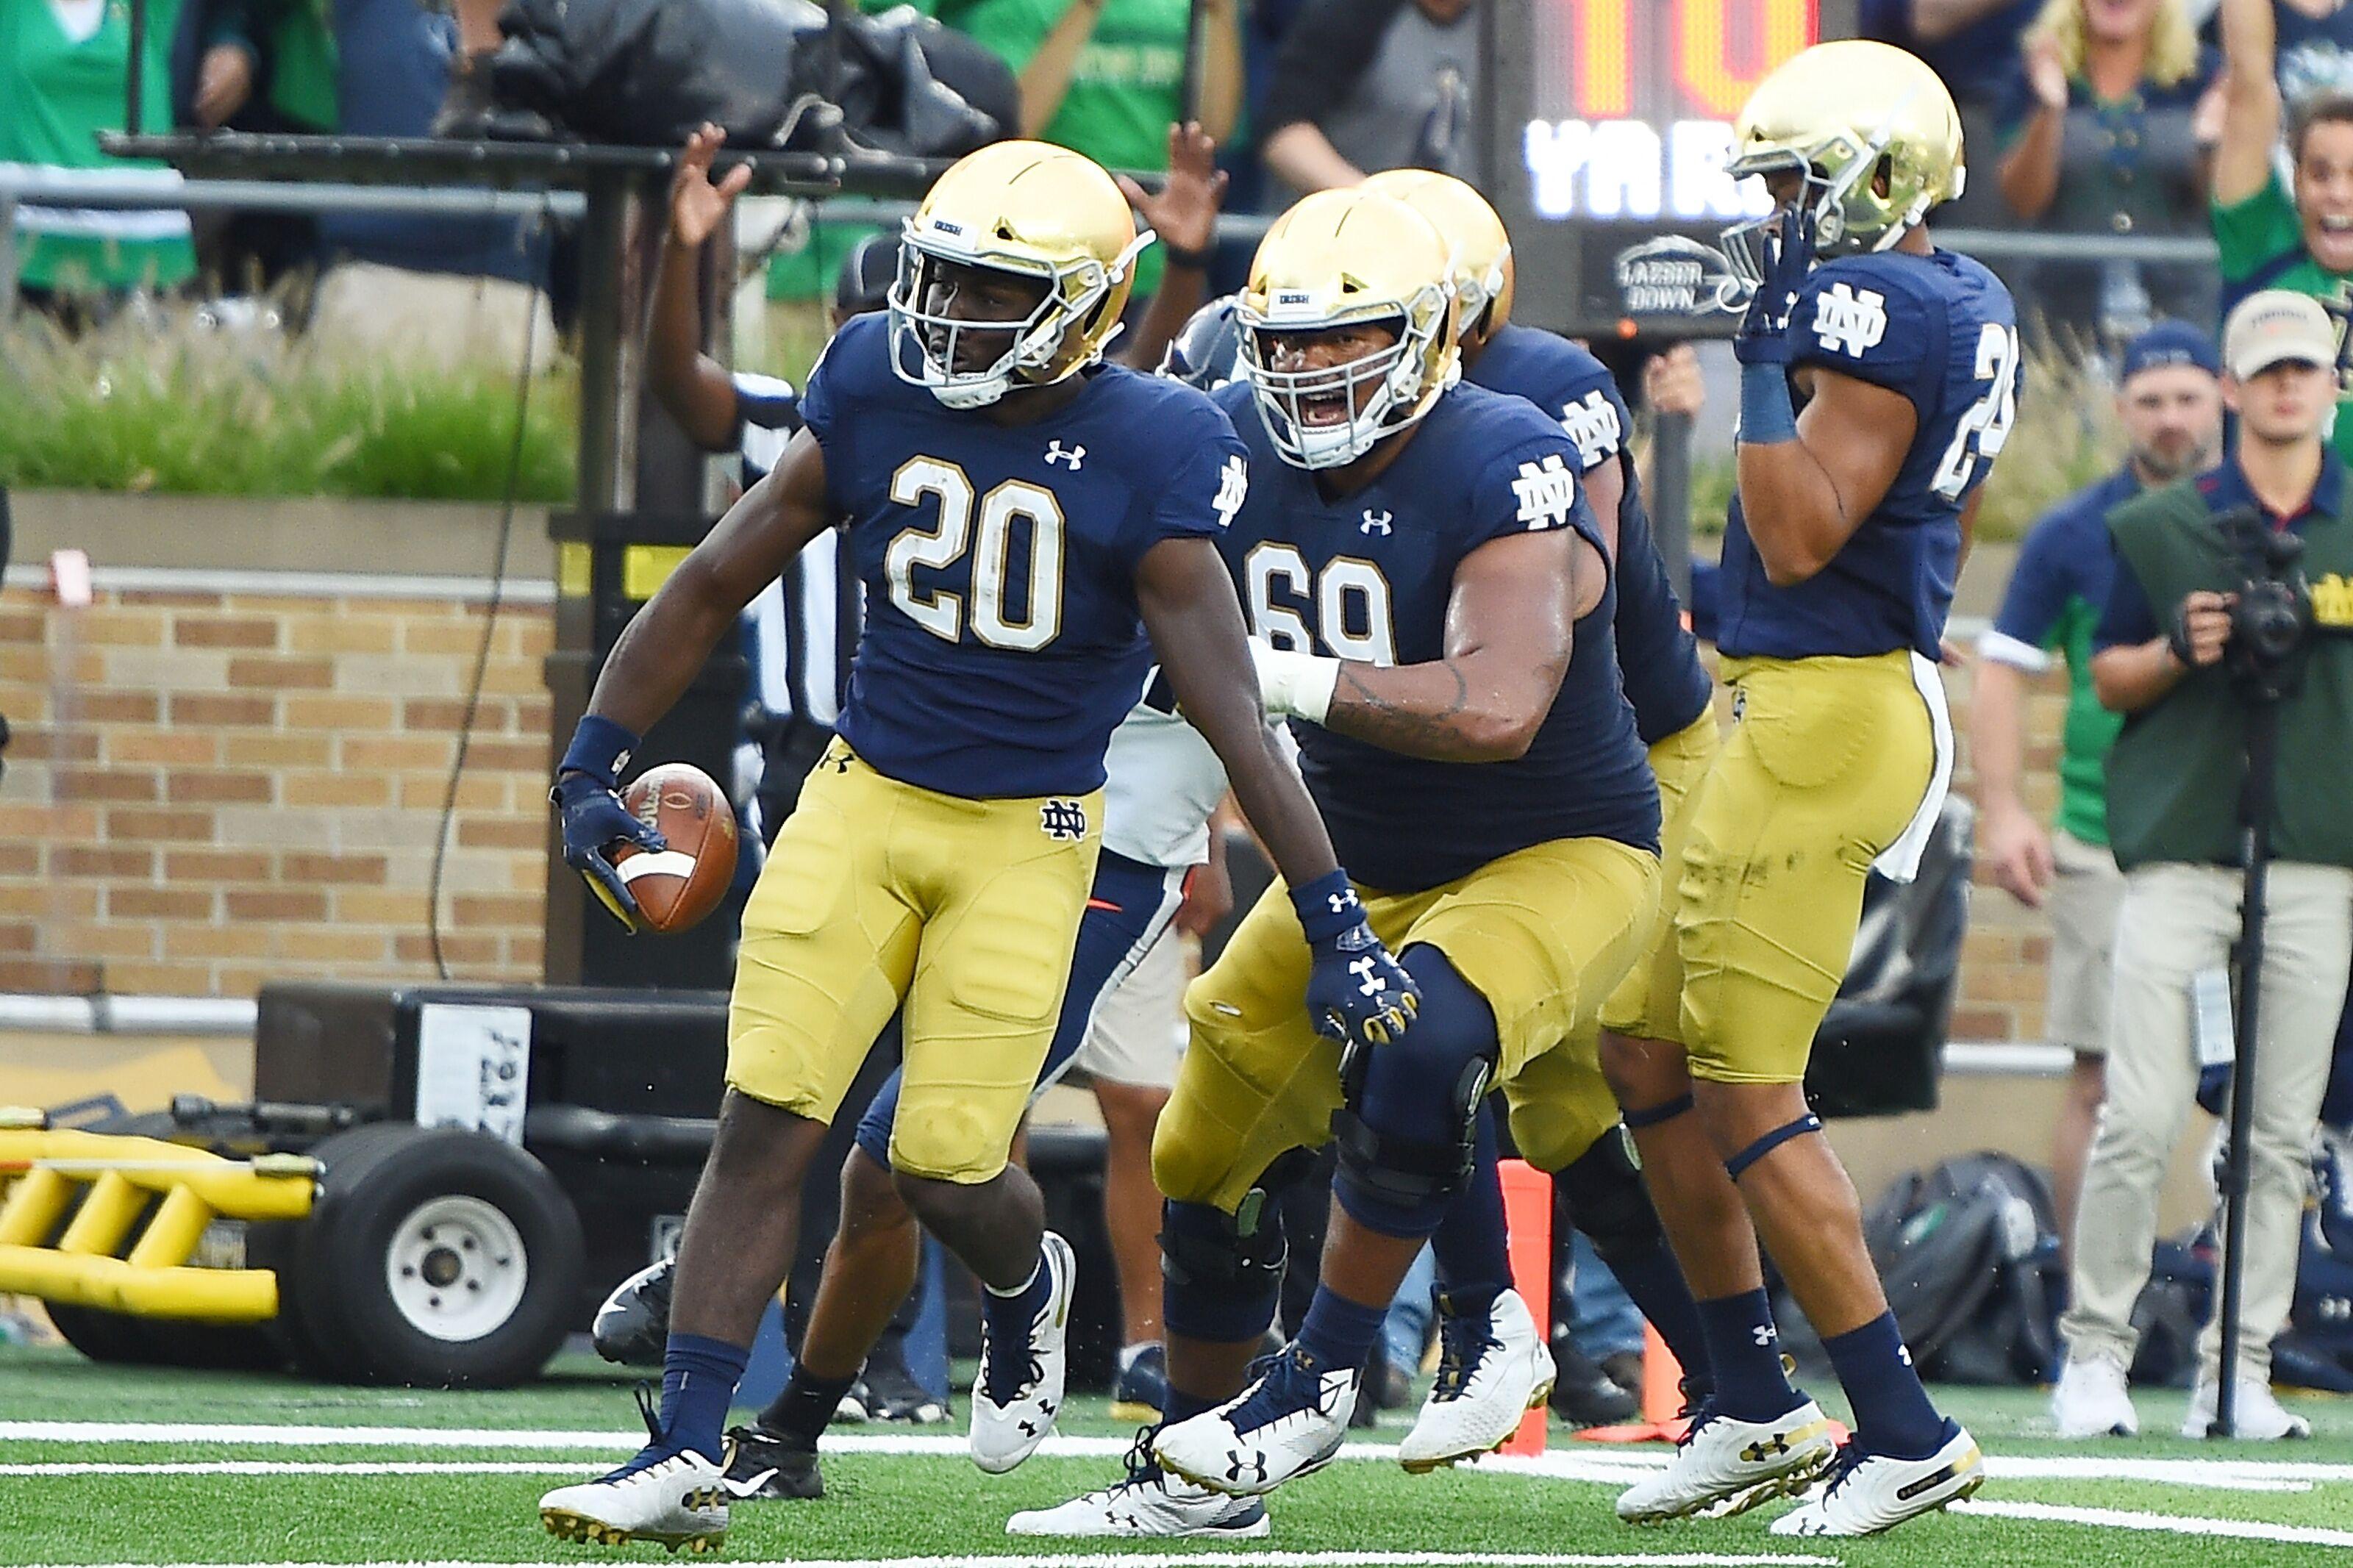 Notre Dame Football: Three bold predictions for the Irish vs. Bowling Green